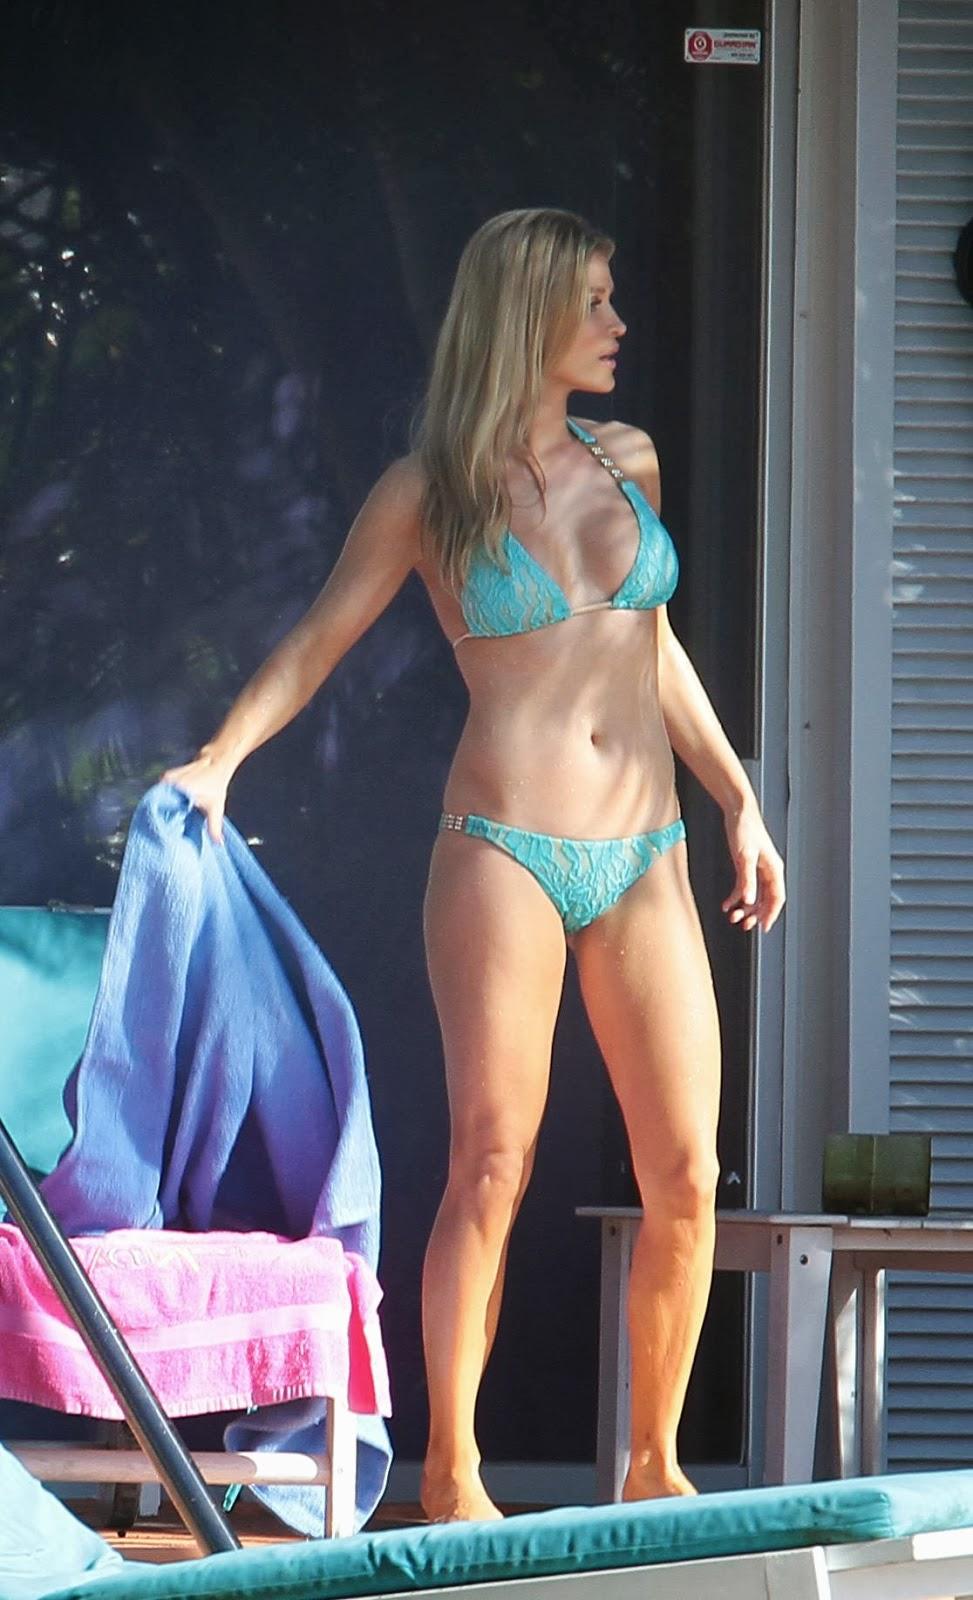 Hot bikini candids pics and galleries